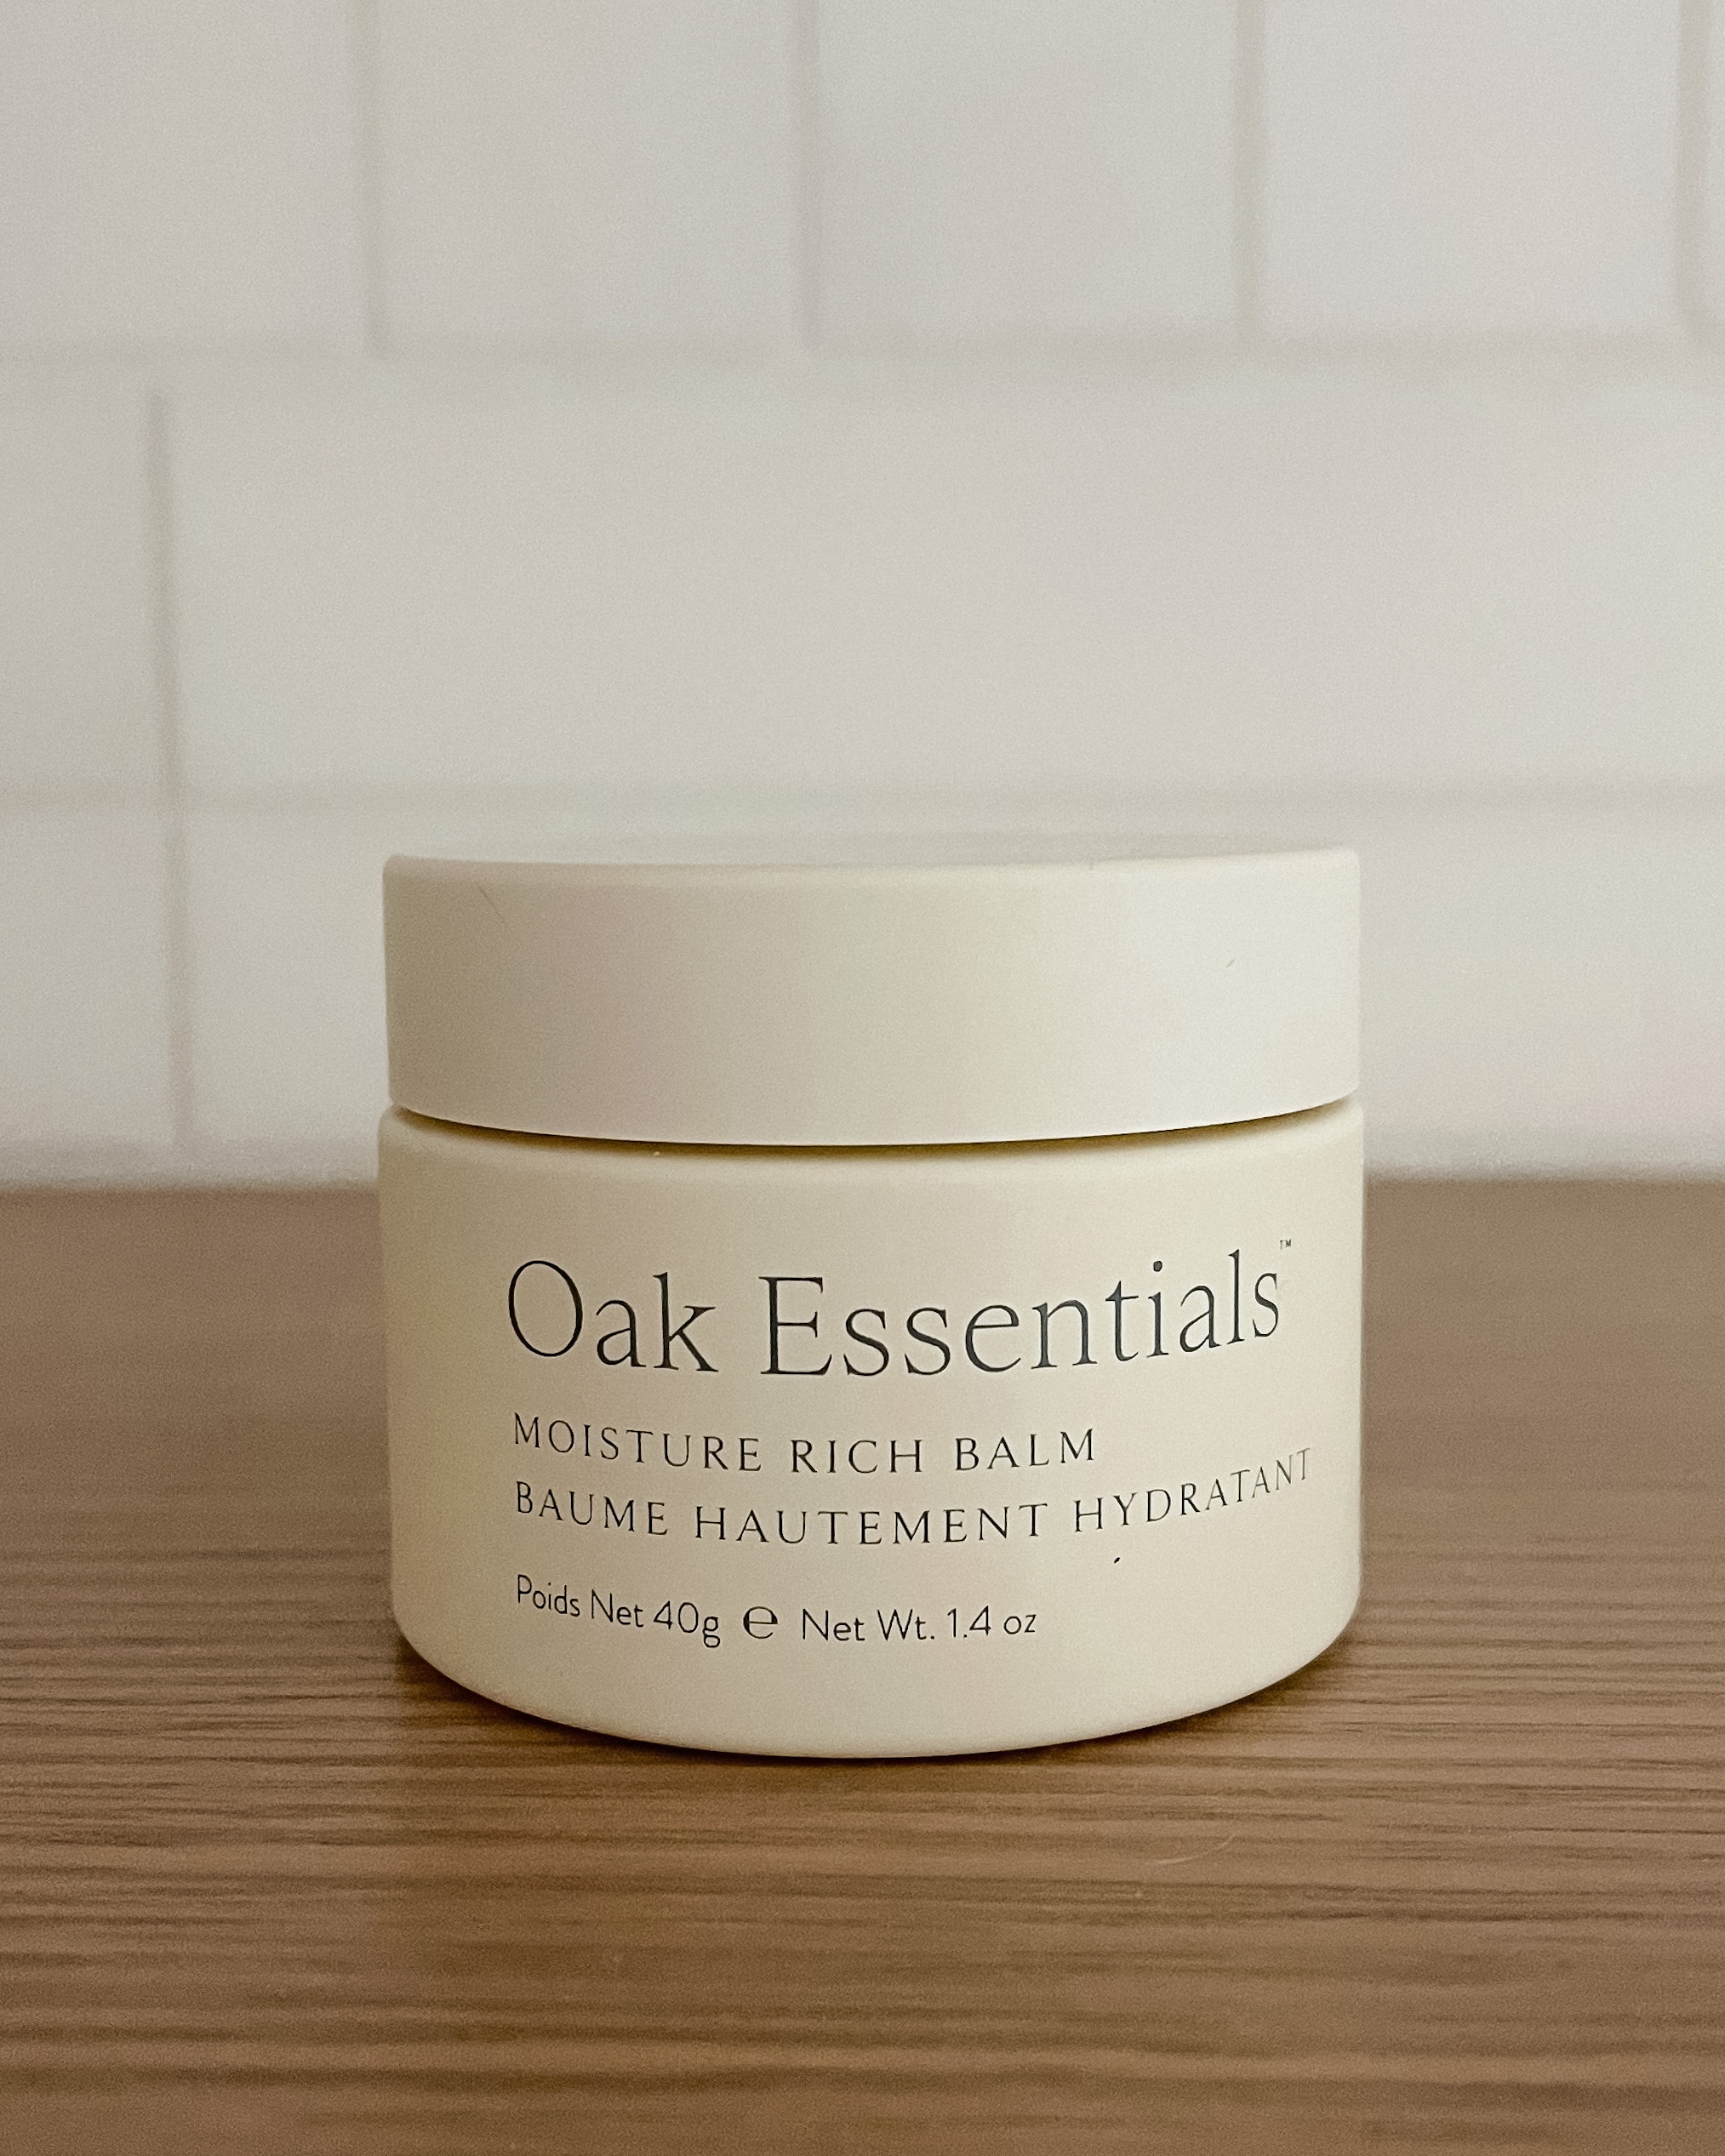 Jenni Kayne Oak Essentials Moisture Rich Balm